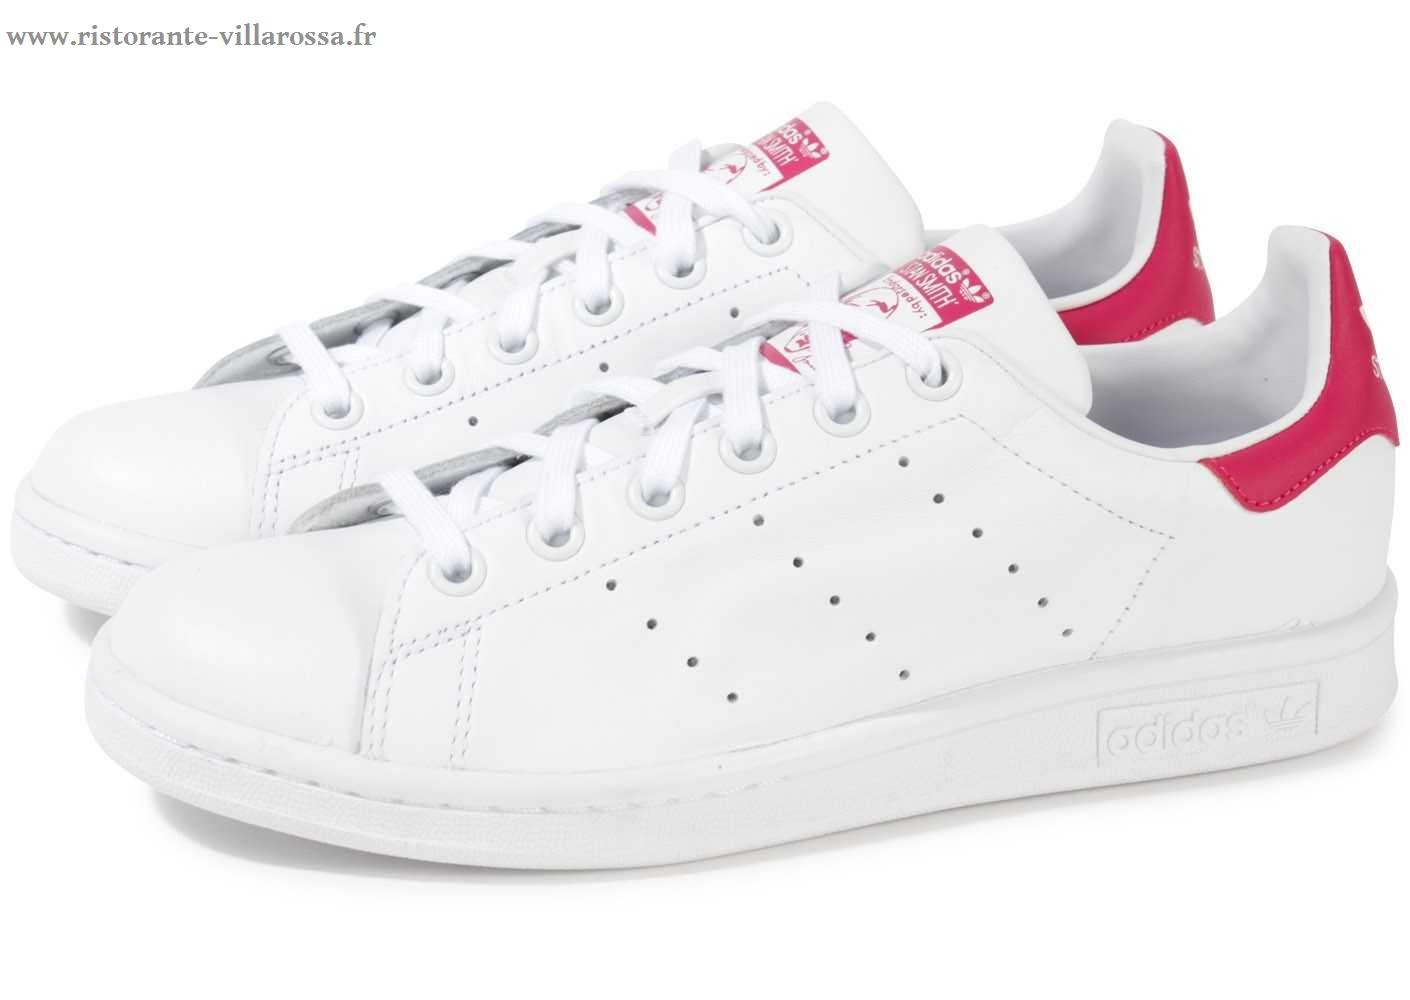 adidas stan smith leopard pas cher allow project.eu